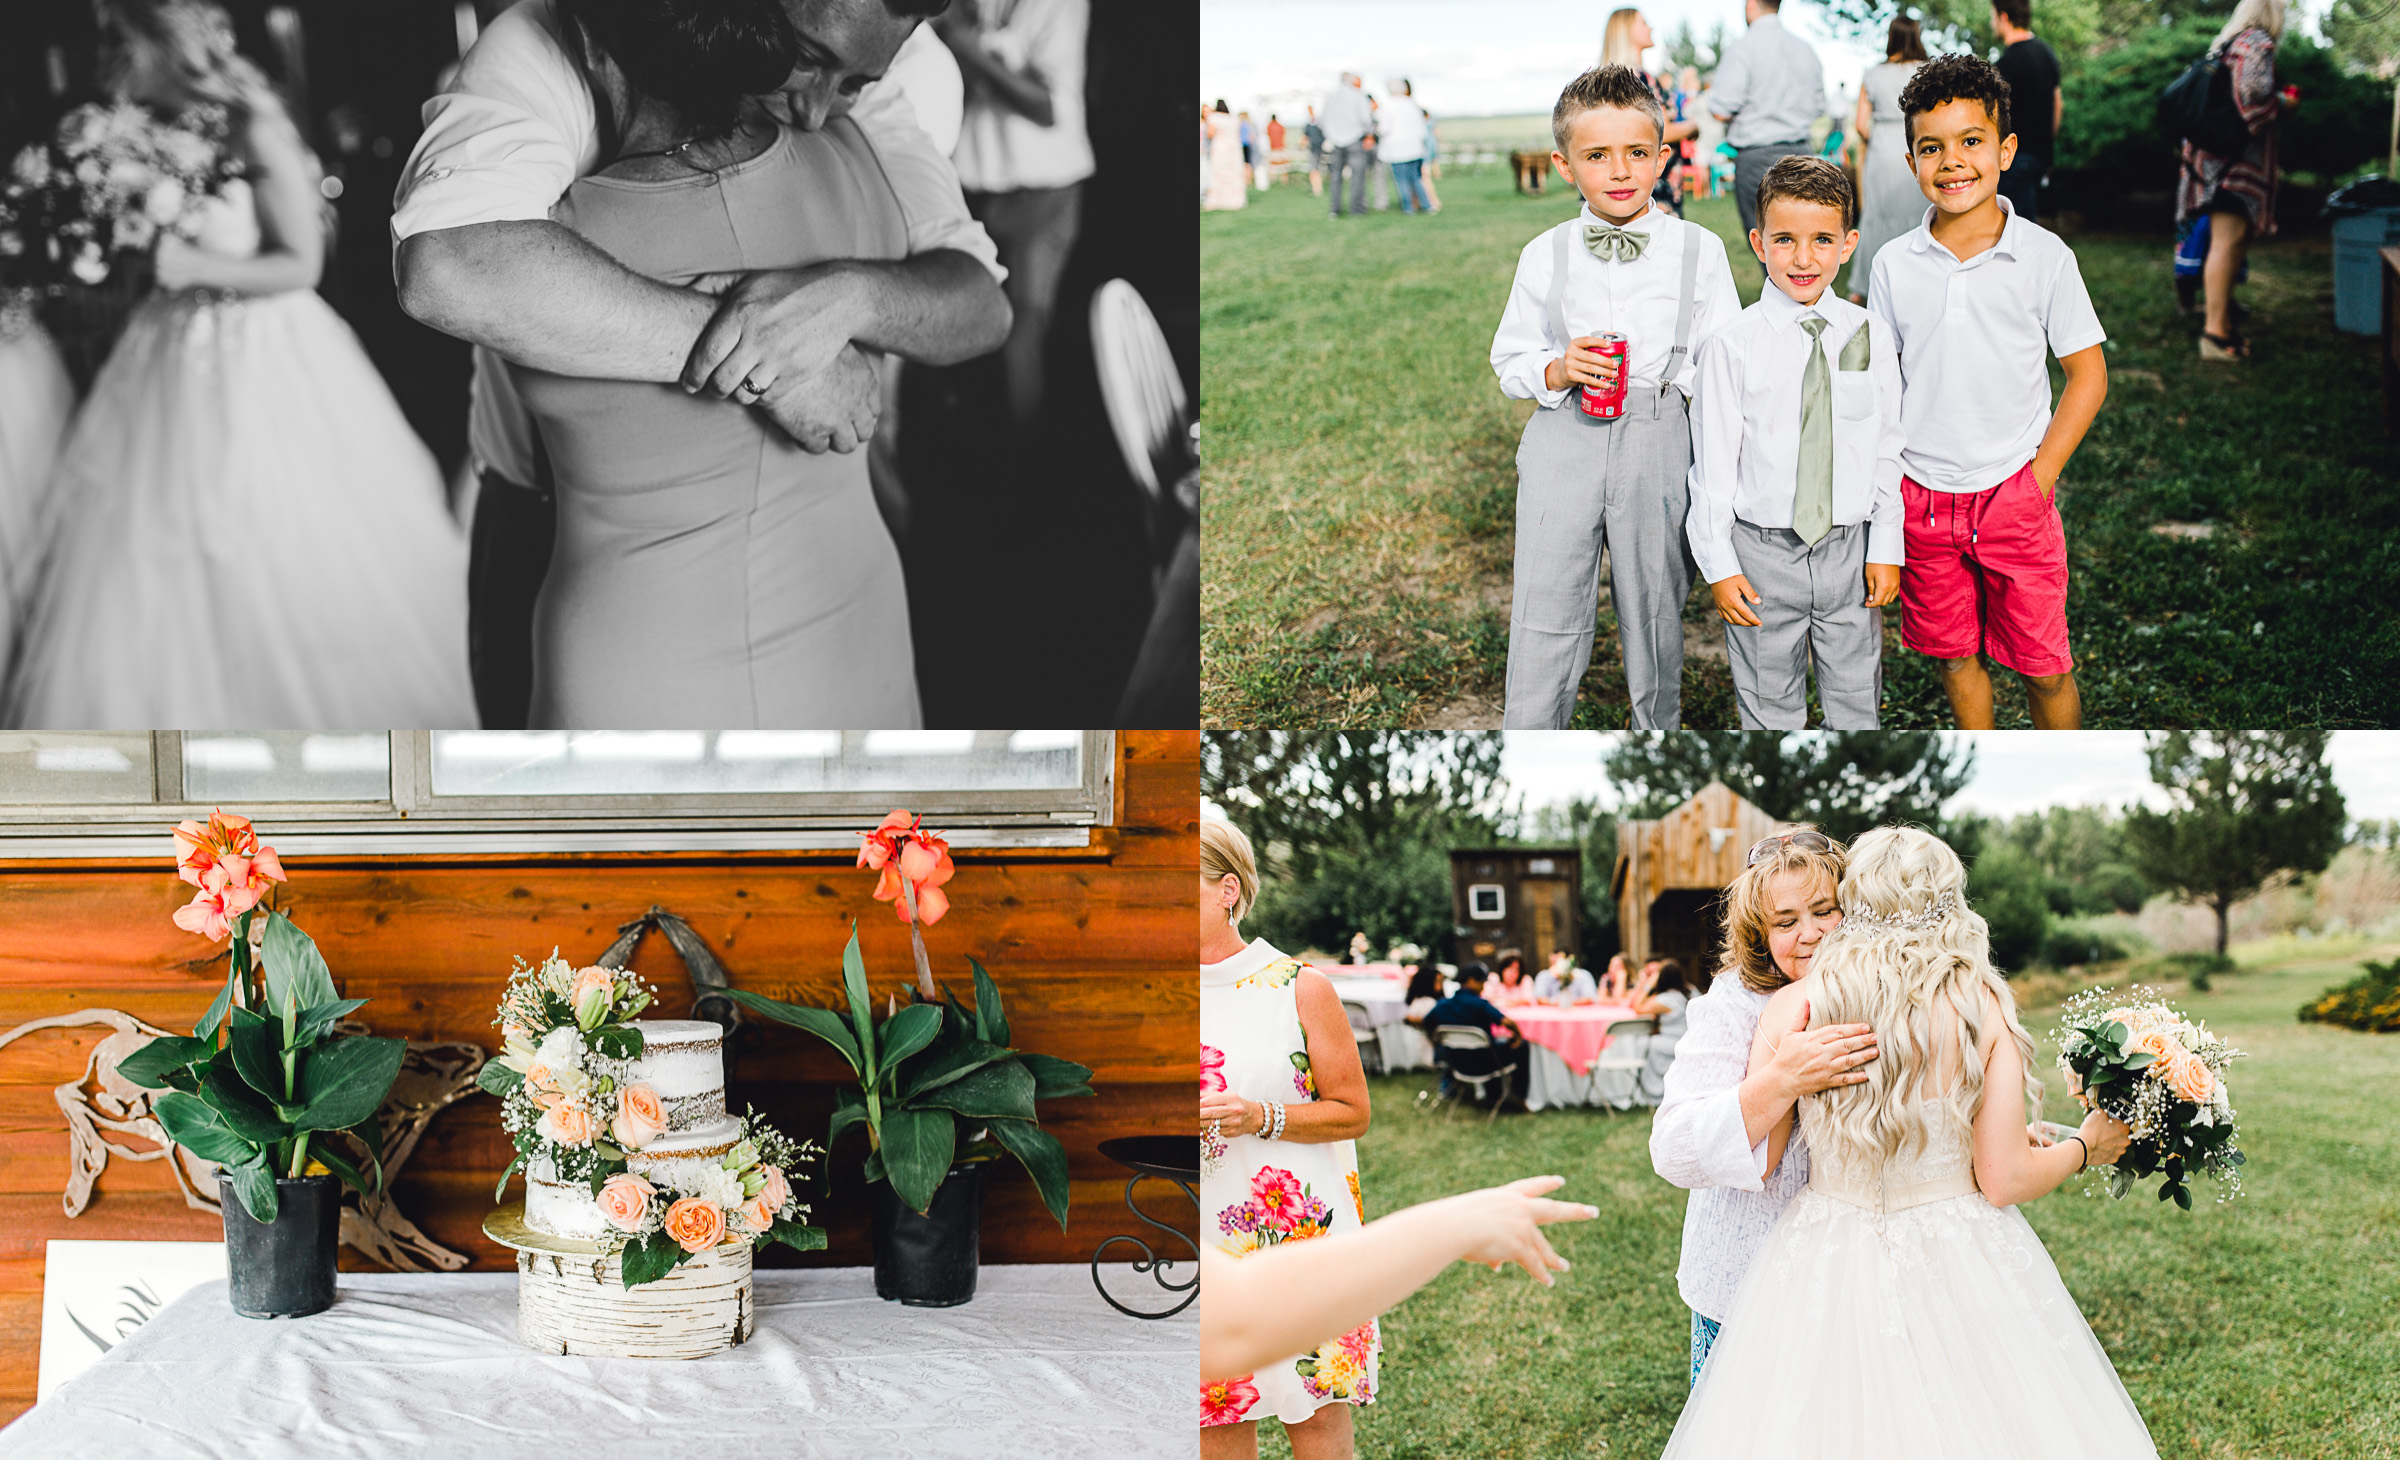 country-outdoor-rustic-wedding-tetons-idaho-anna-christine-photo-22.jpg